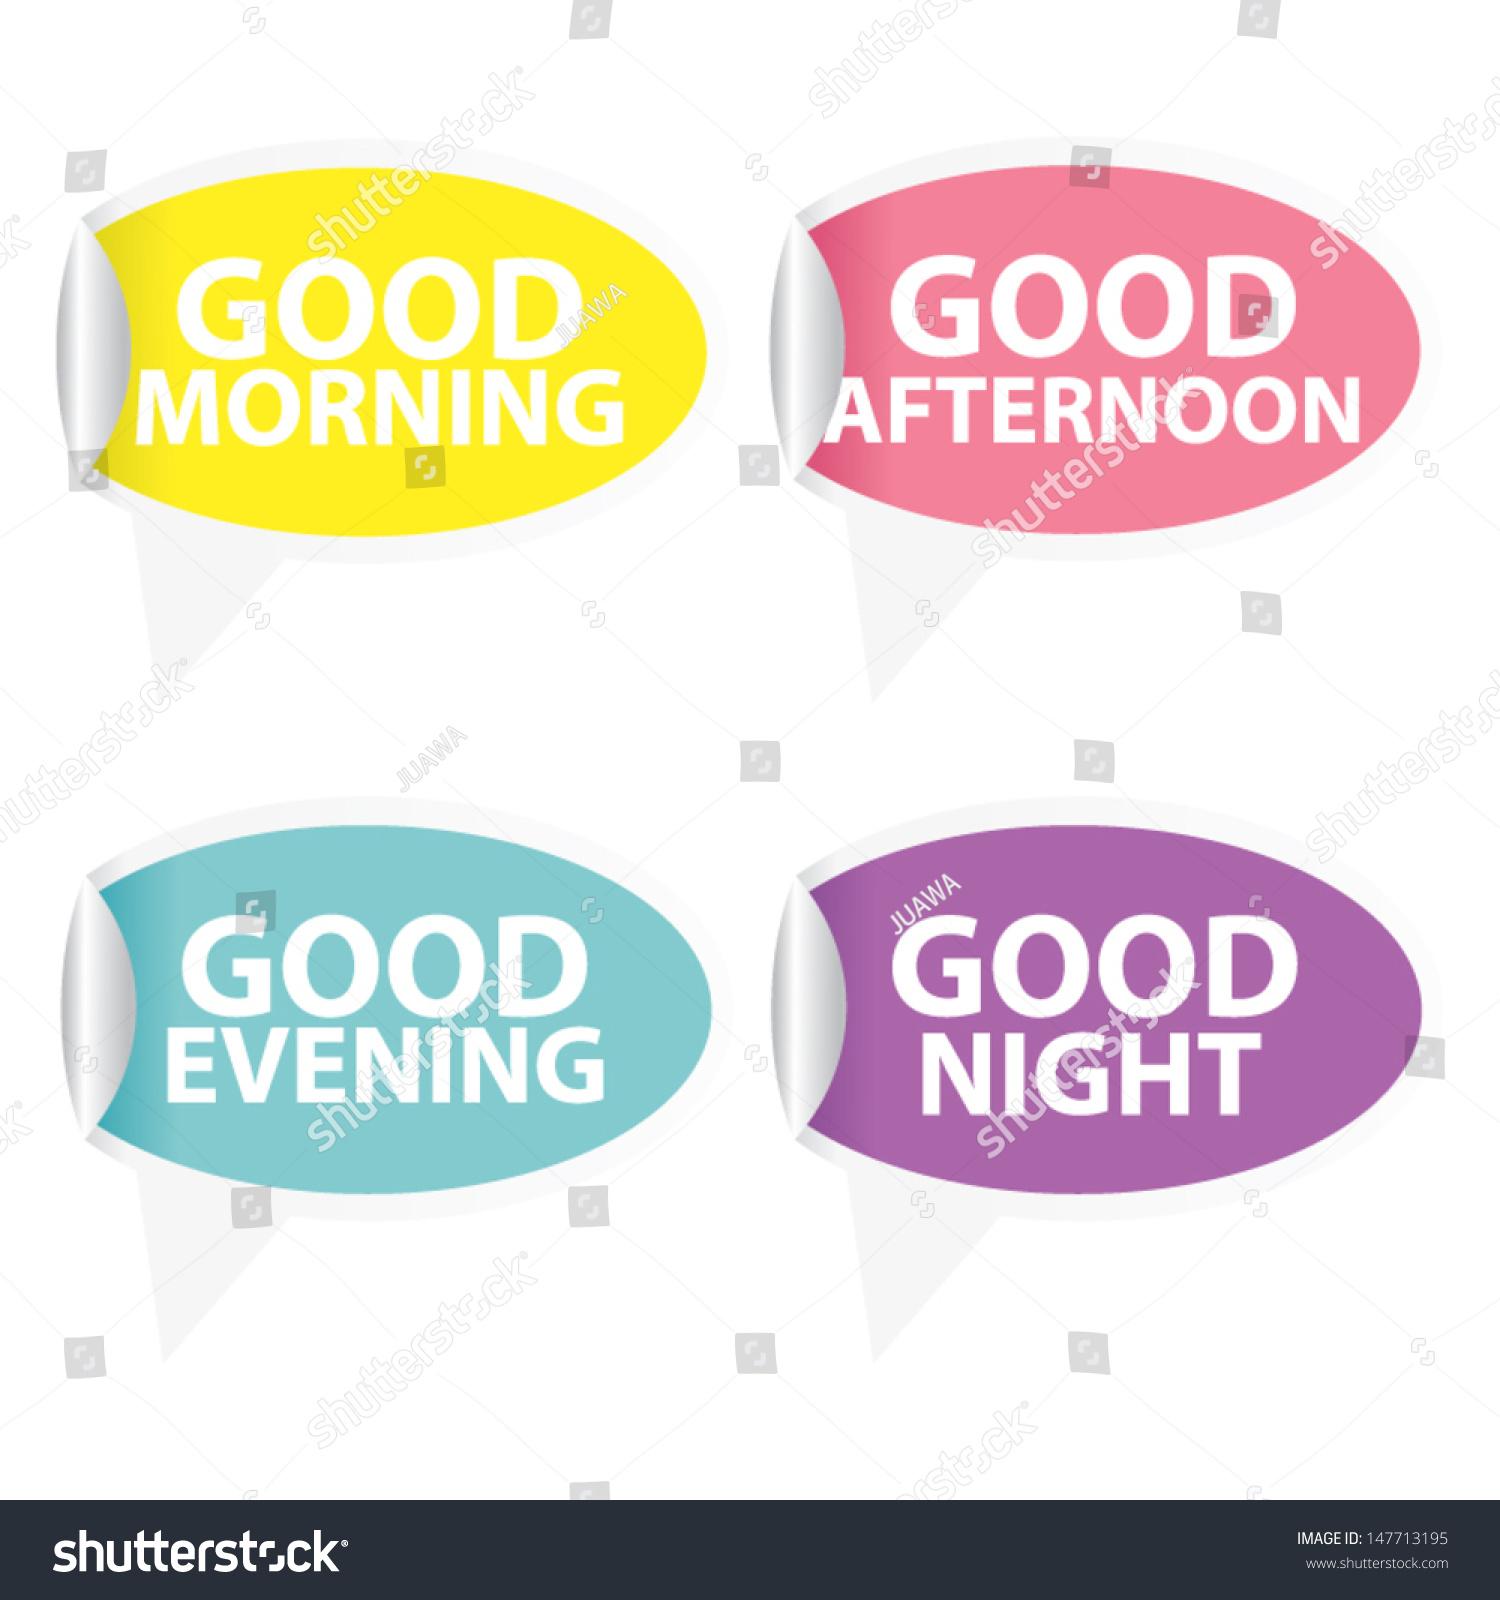 Good Morning Good Afternoon Good Evening Stock Vector